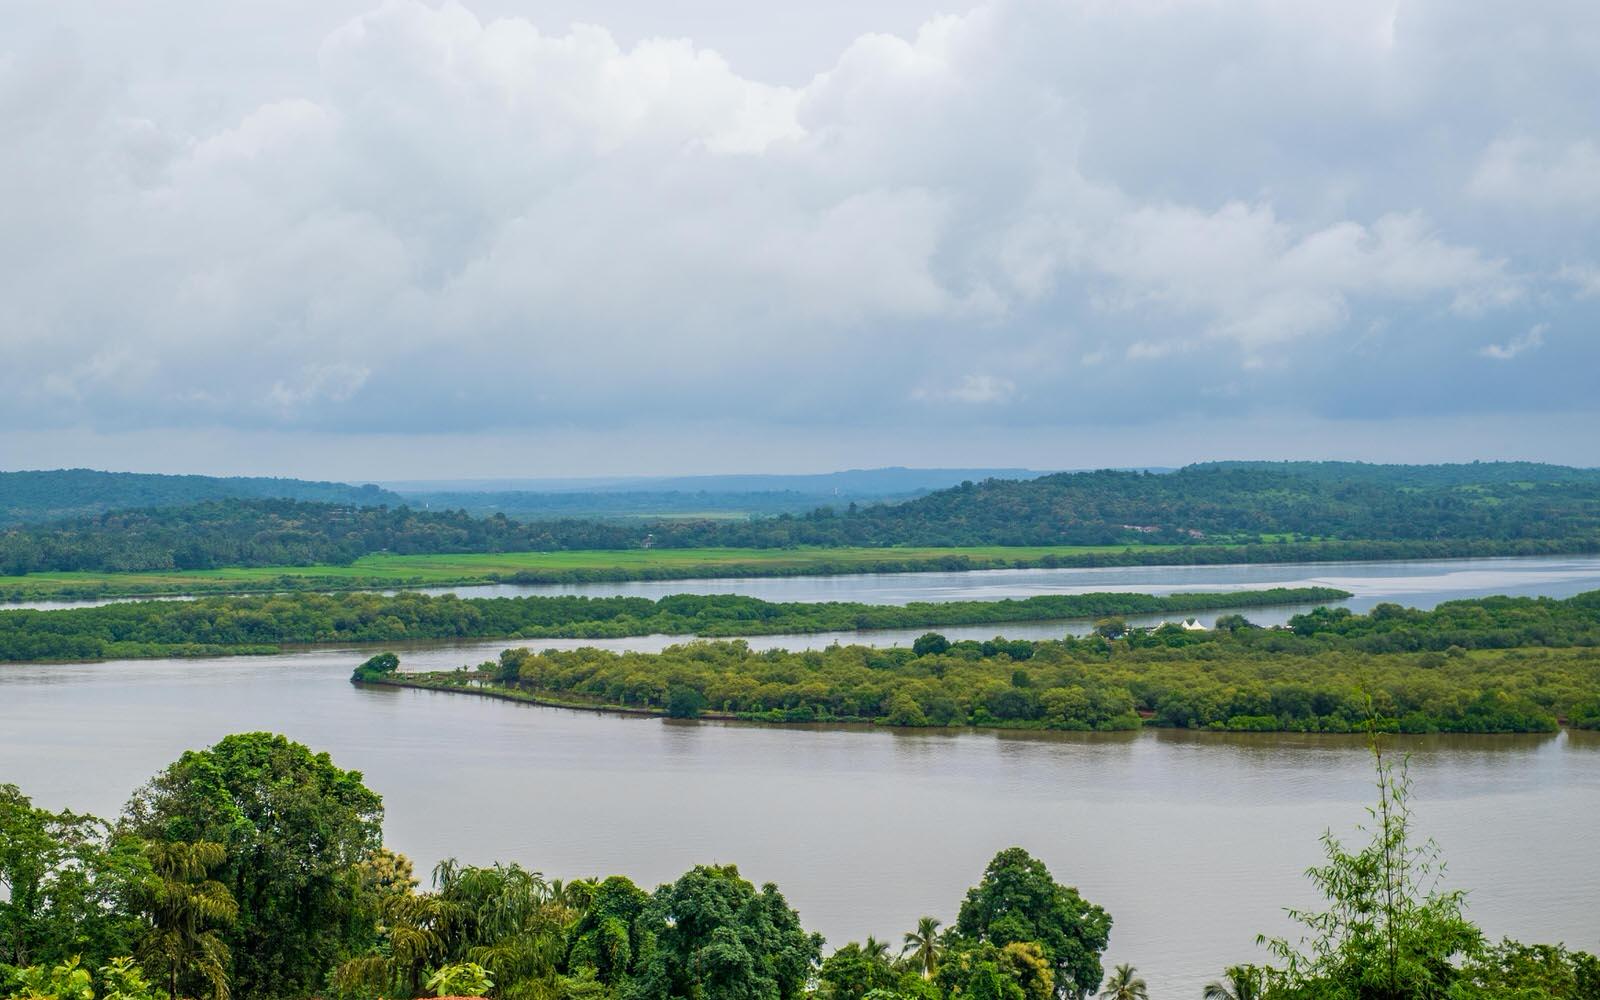 Mandovi river, Panjim